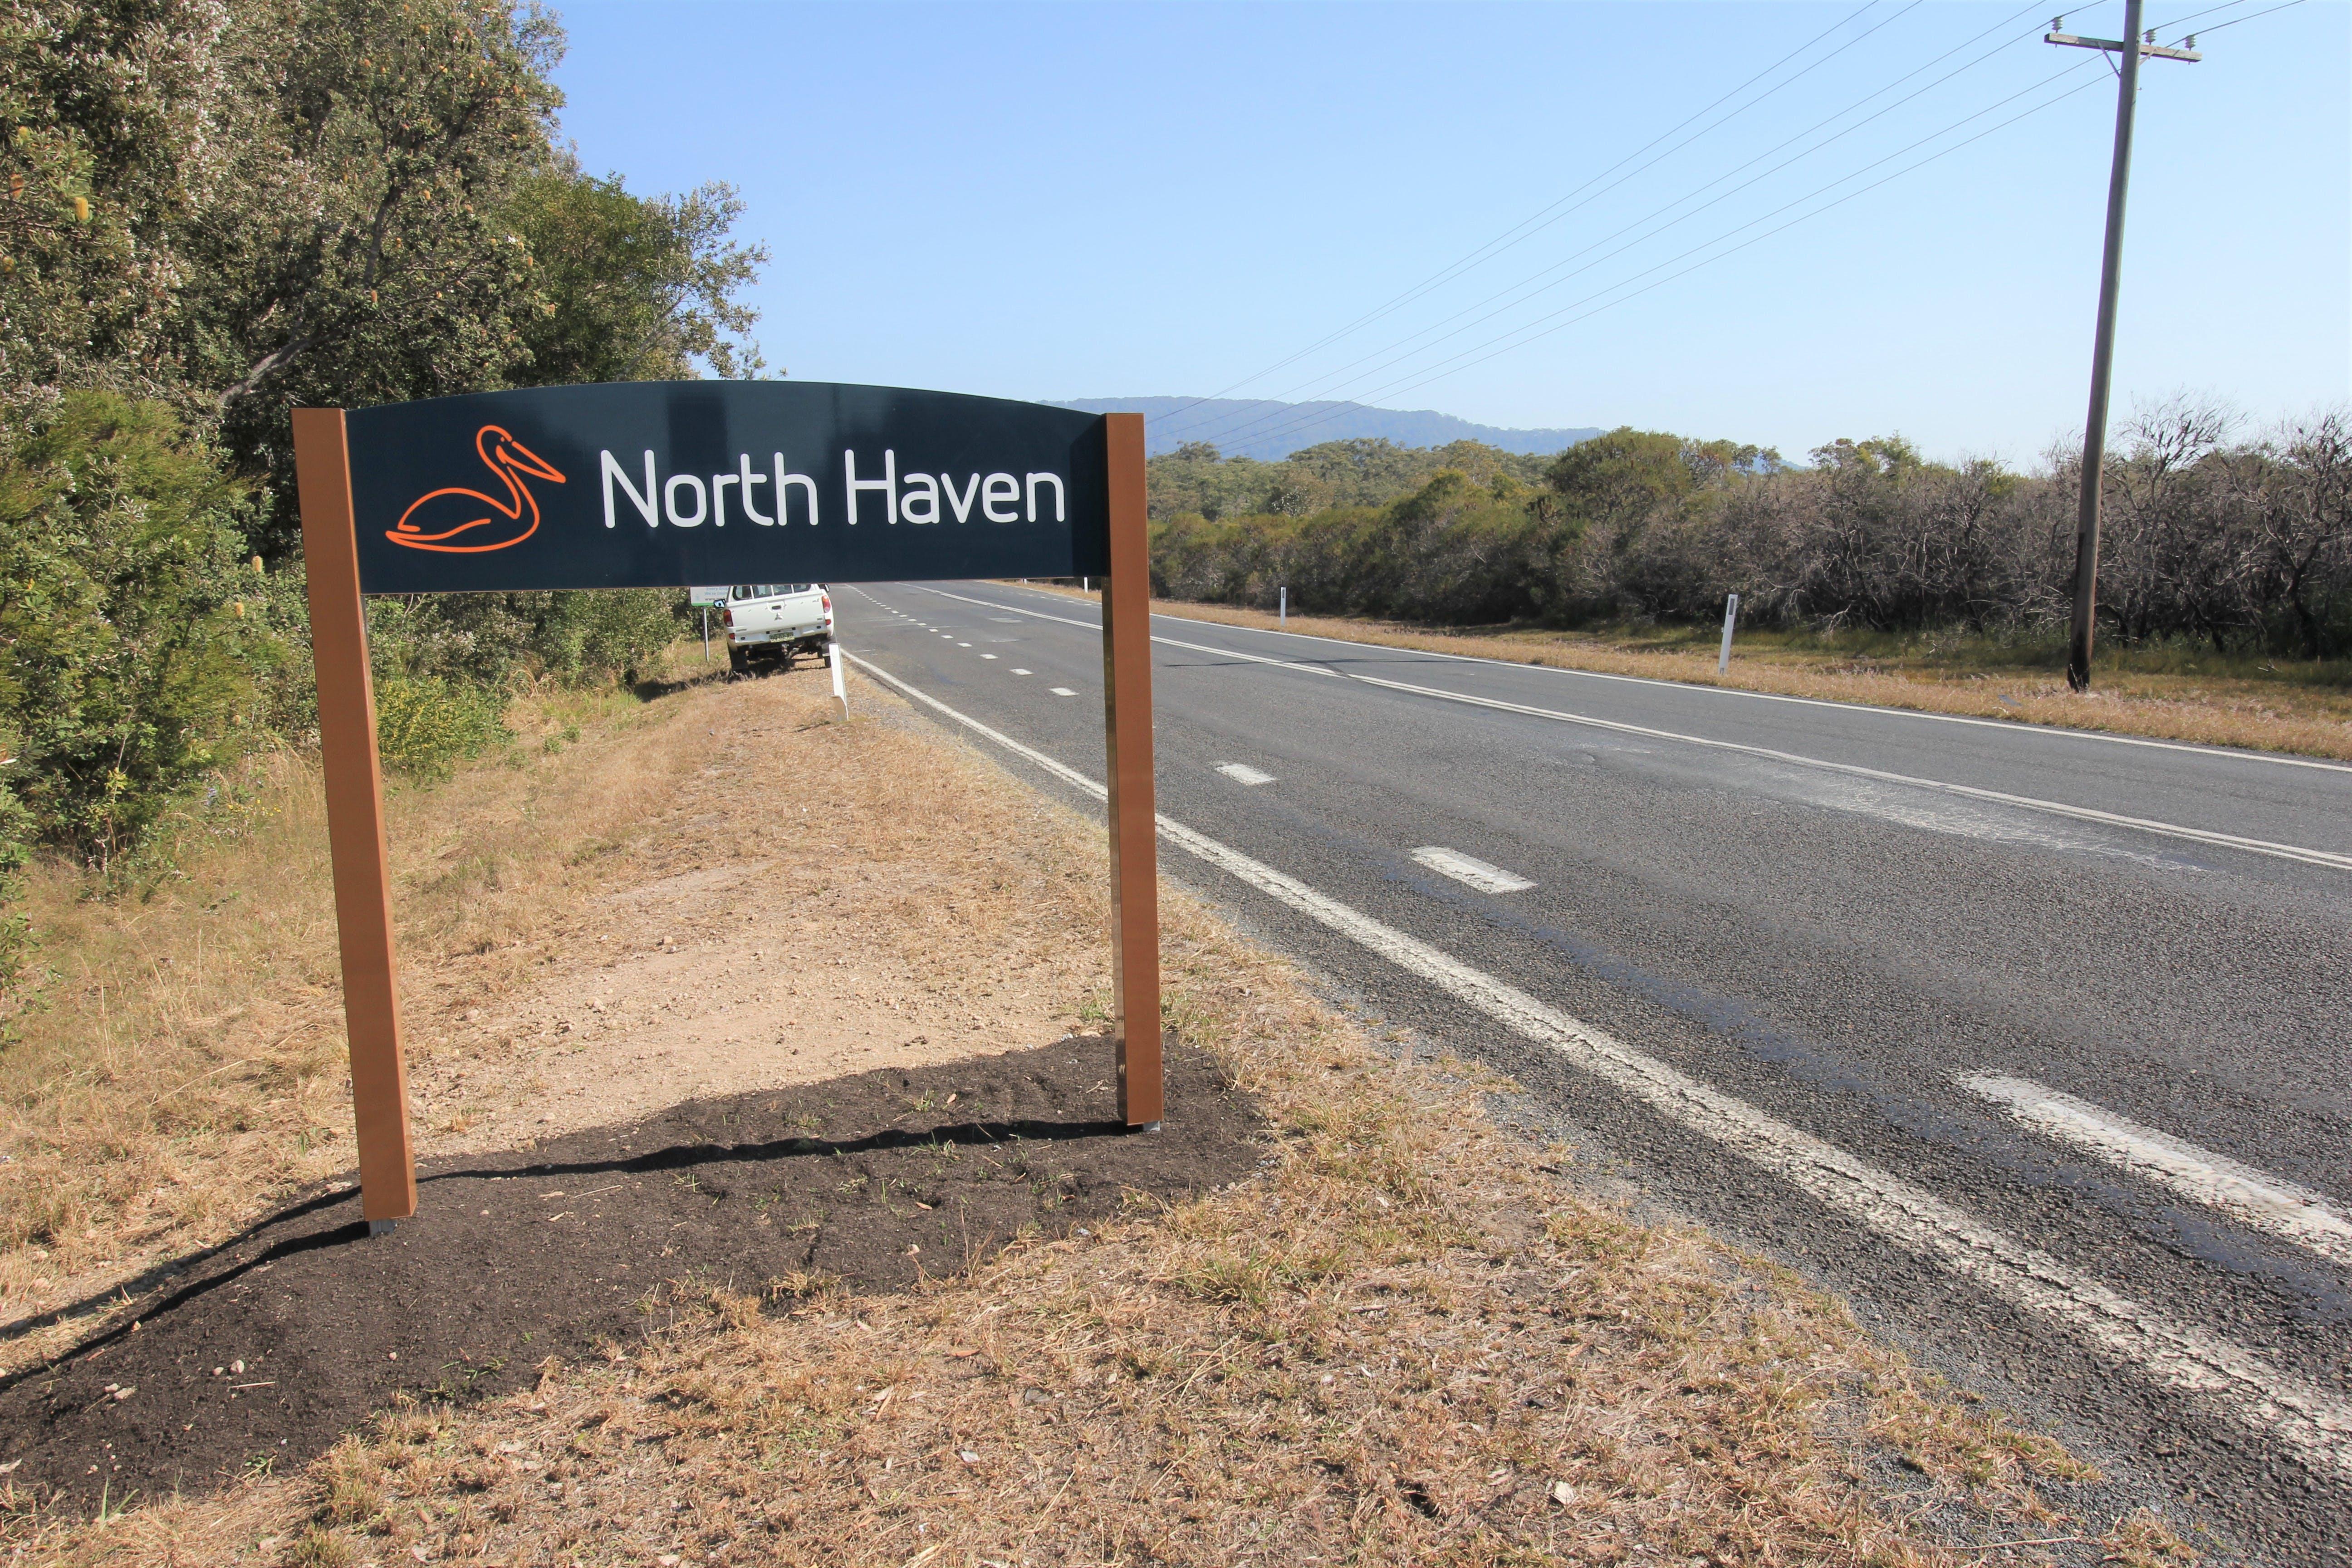 North Haven enrty sign